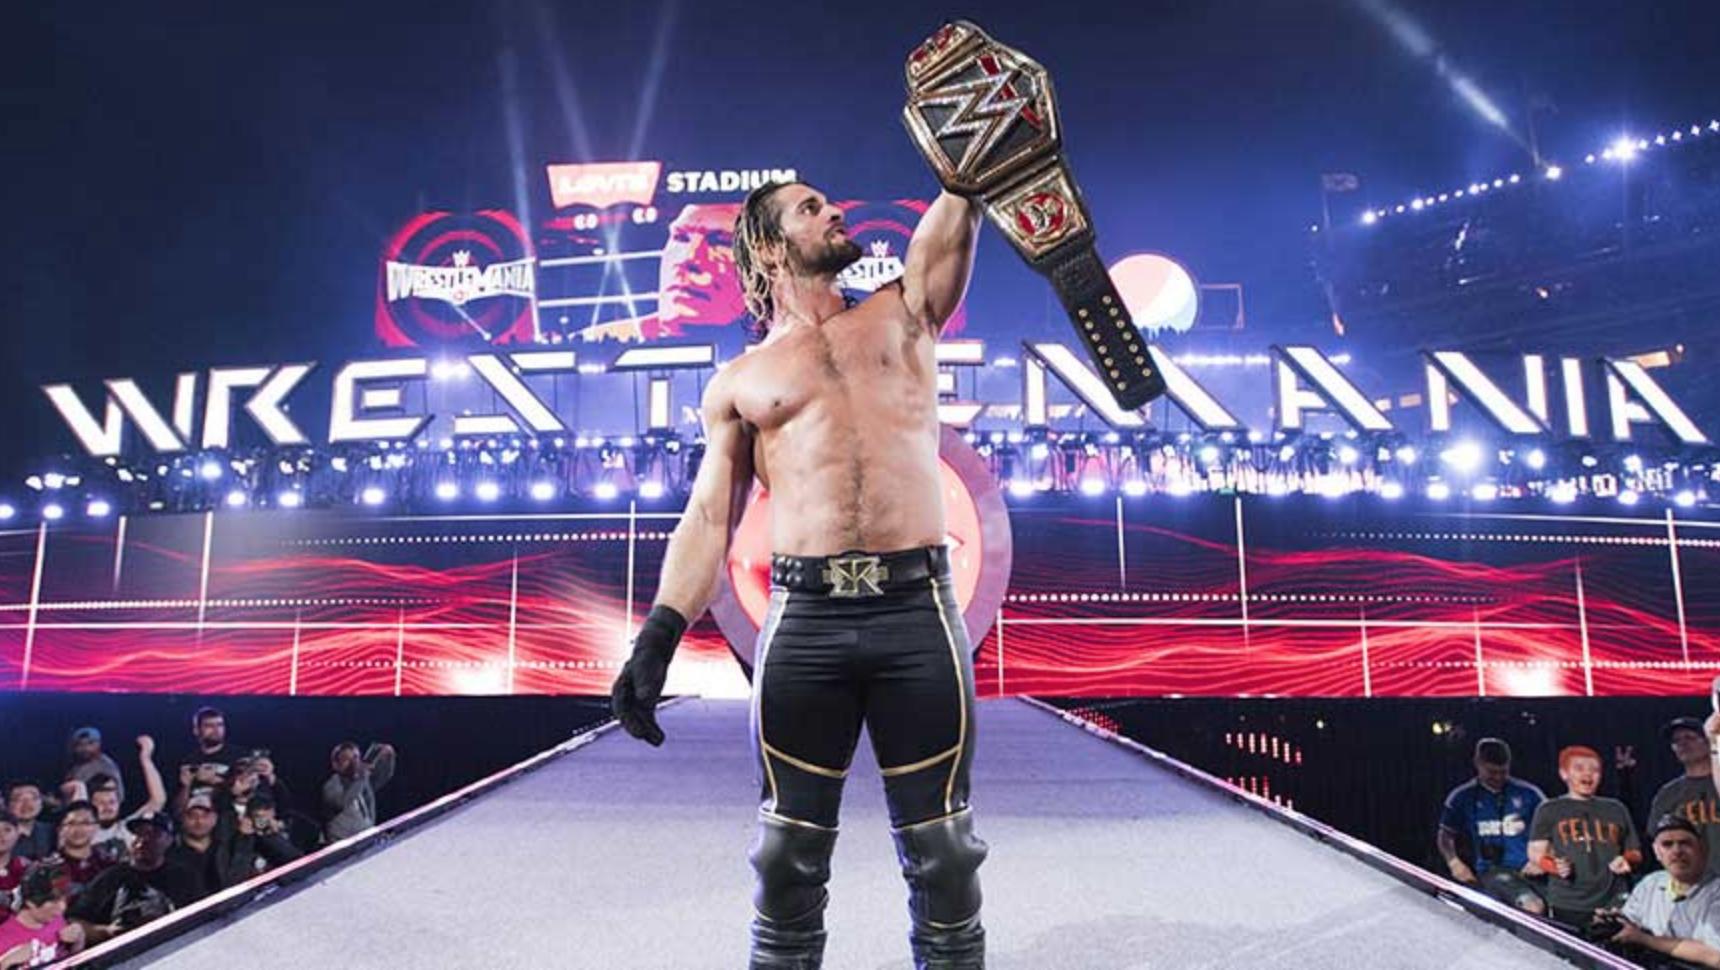 A wrestler holds up a championship belt on the entrance ramp.